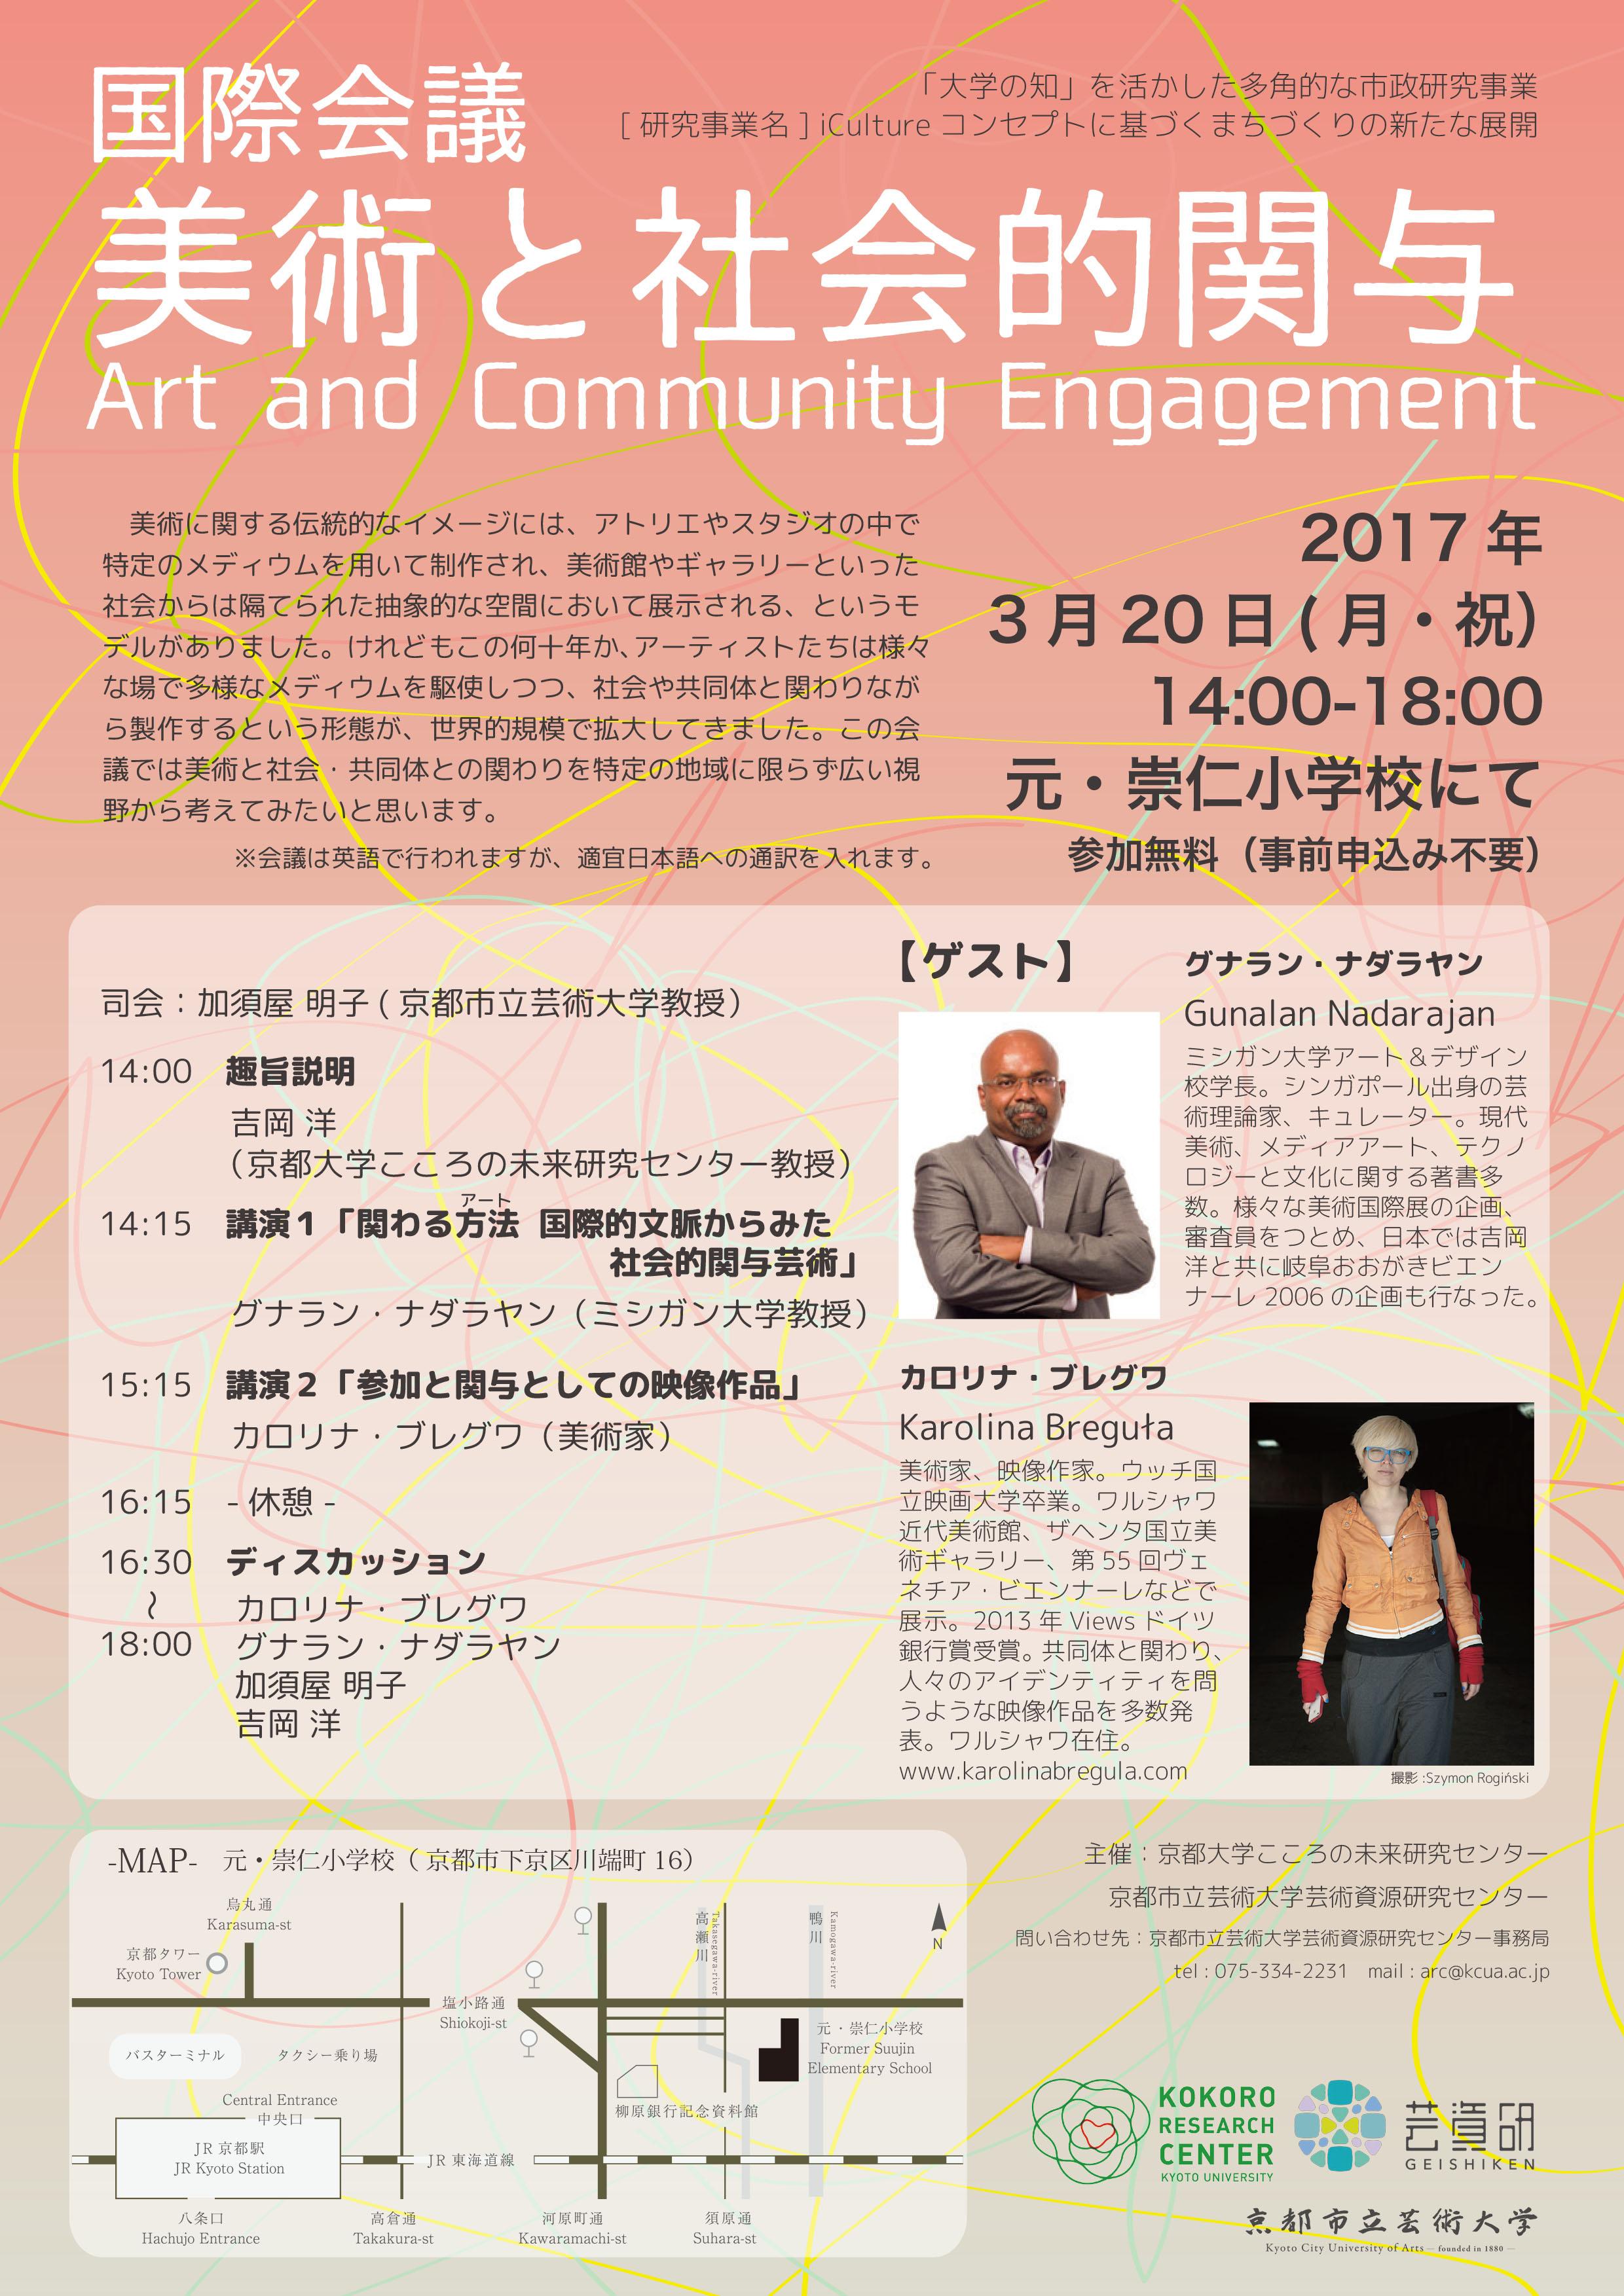 art and community engagement 0320.jpg